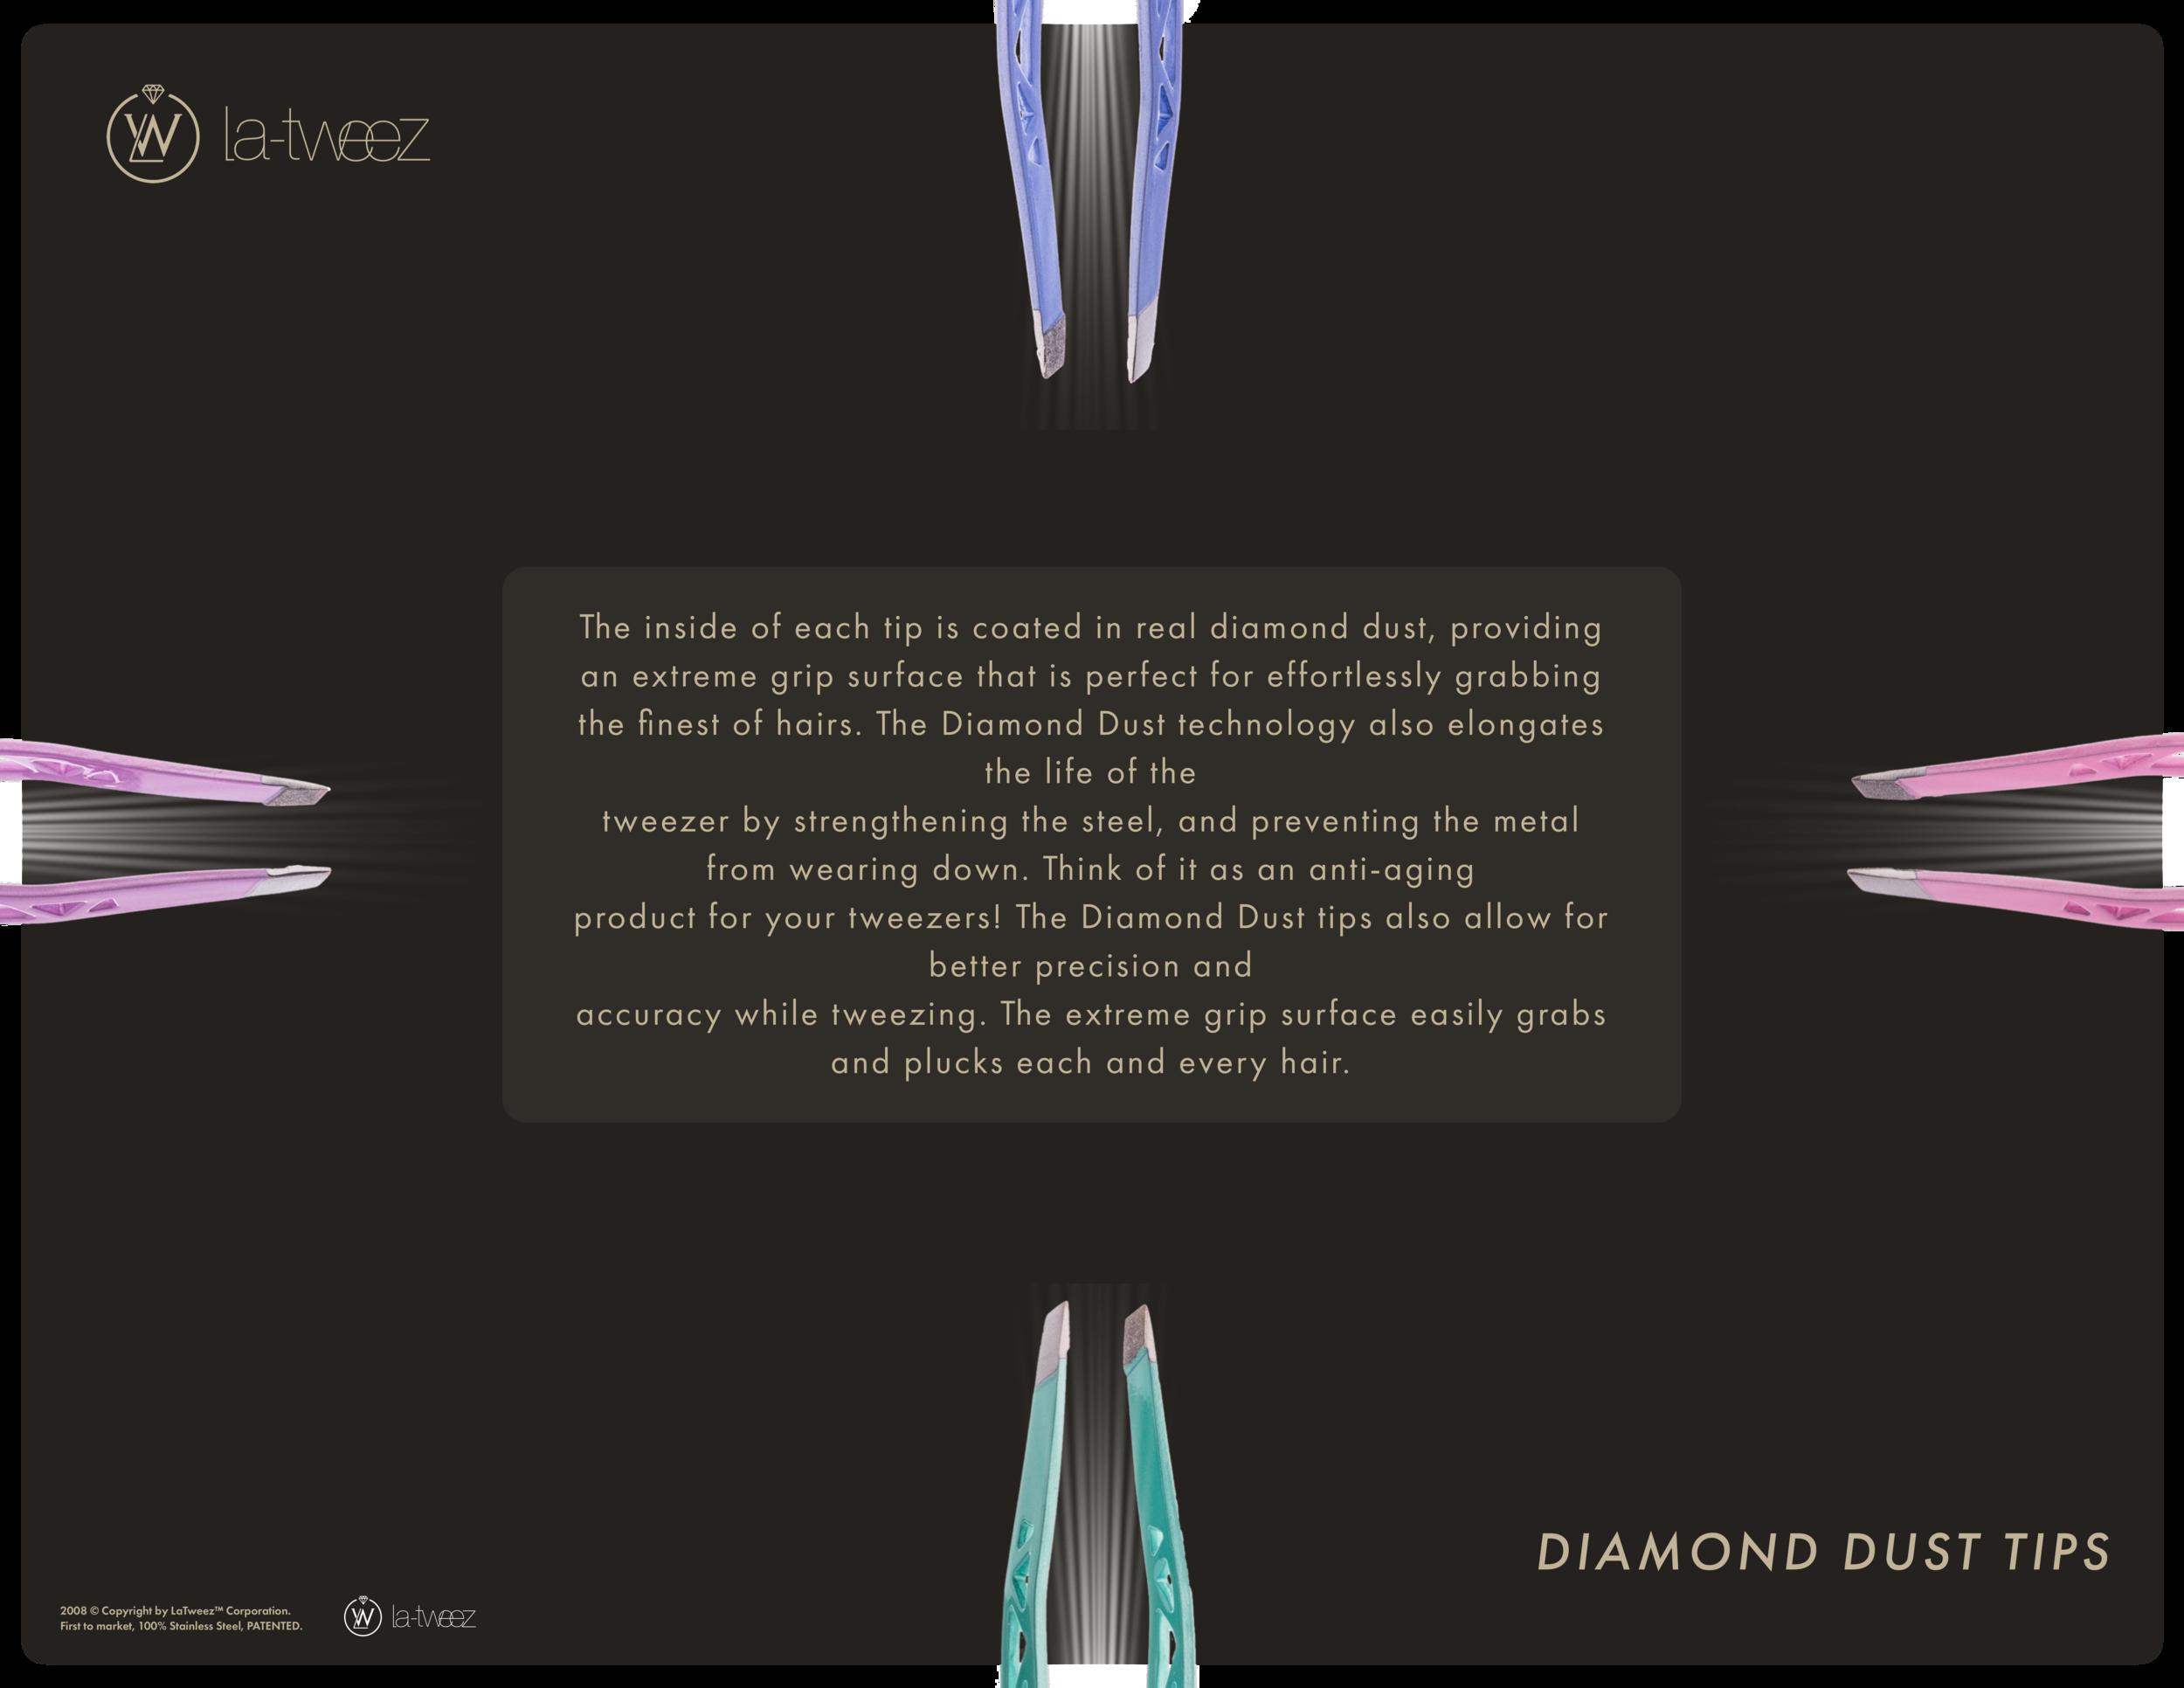 Latweez Diamond Dust Tips